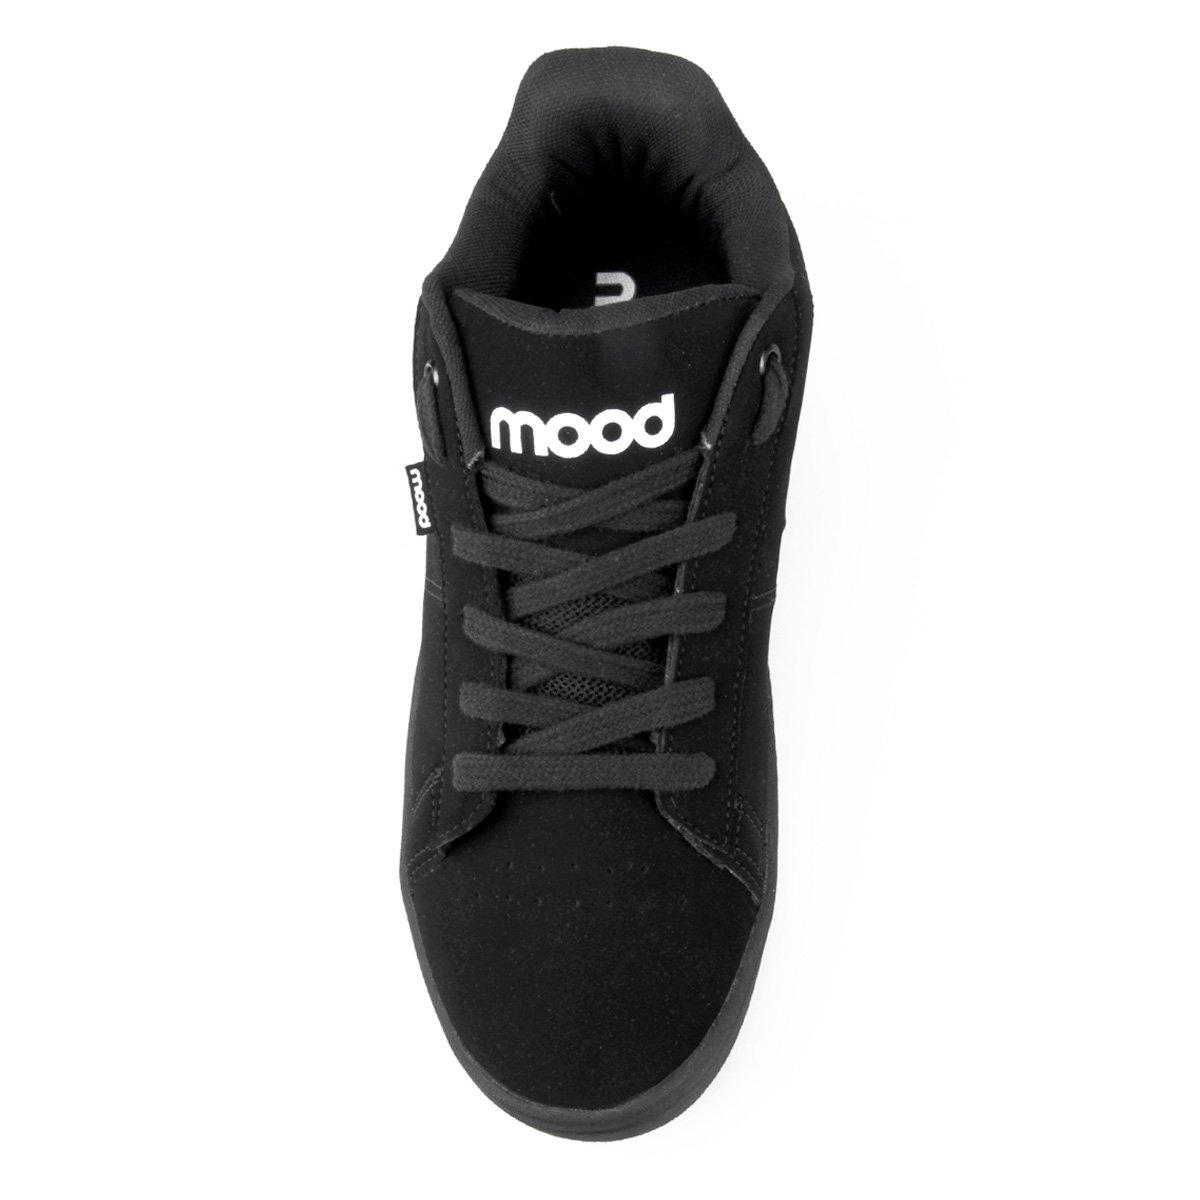 Masculino Mood Tênis Tênis Mood Base Preto a7qp6v